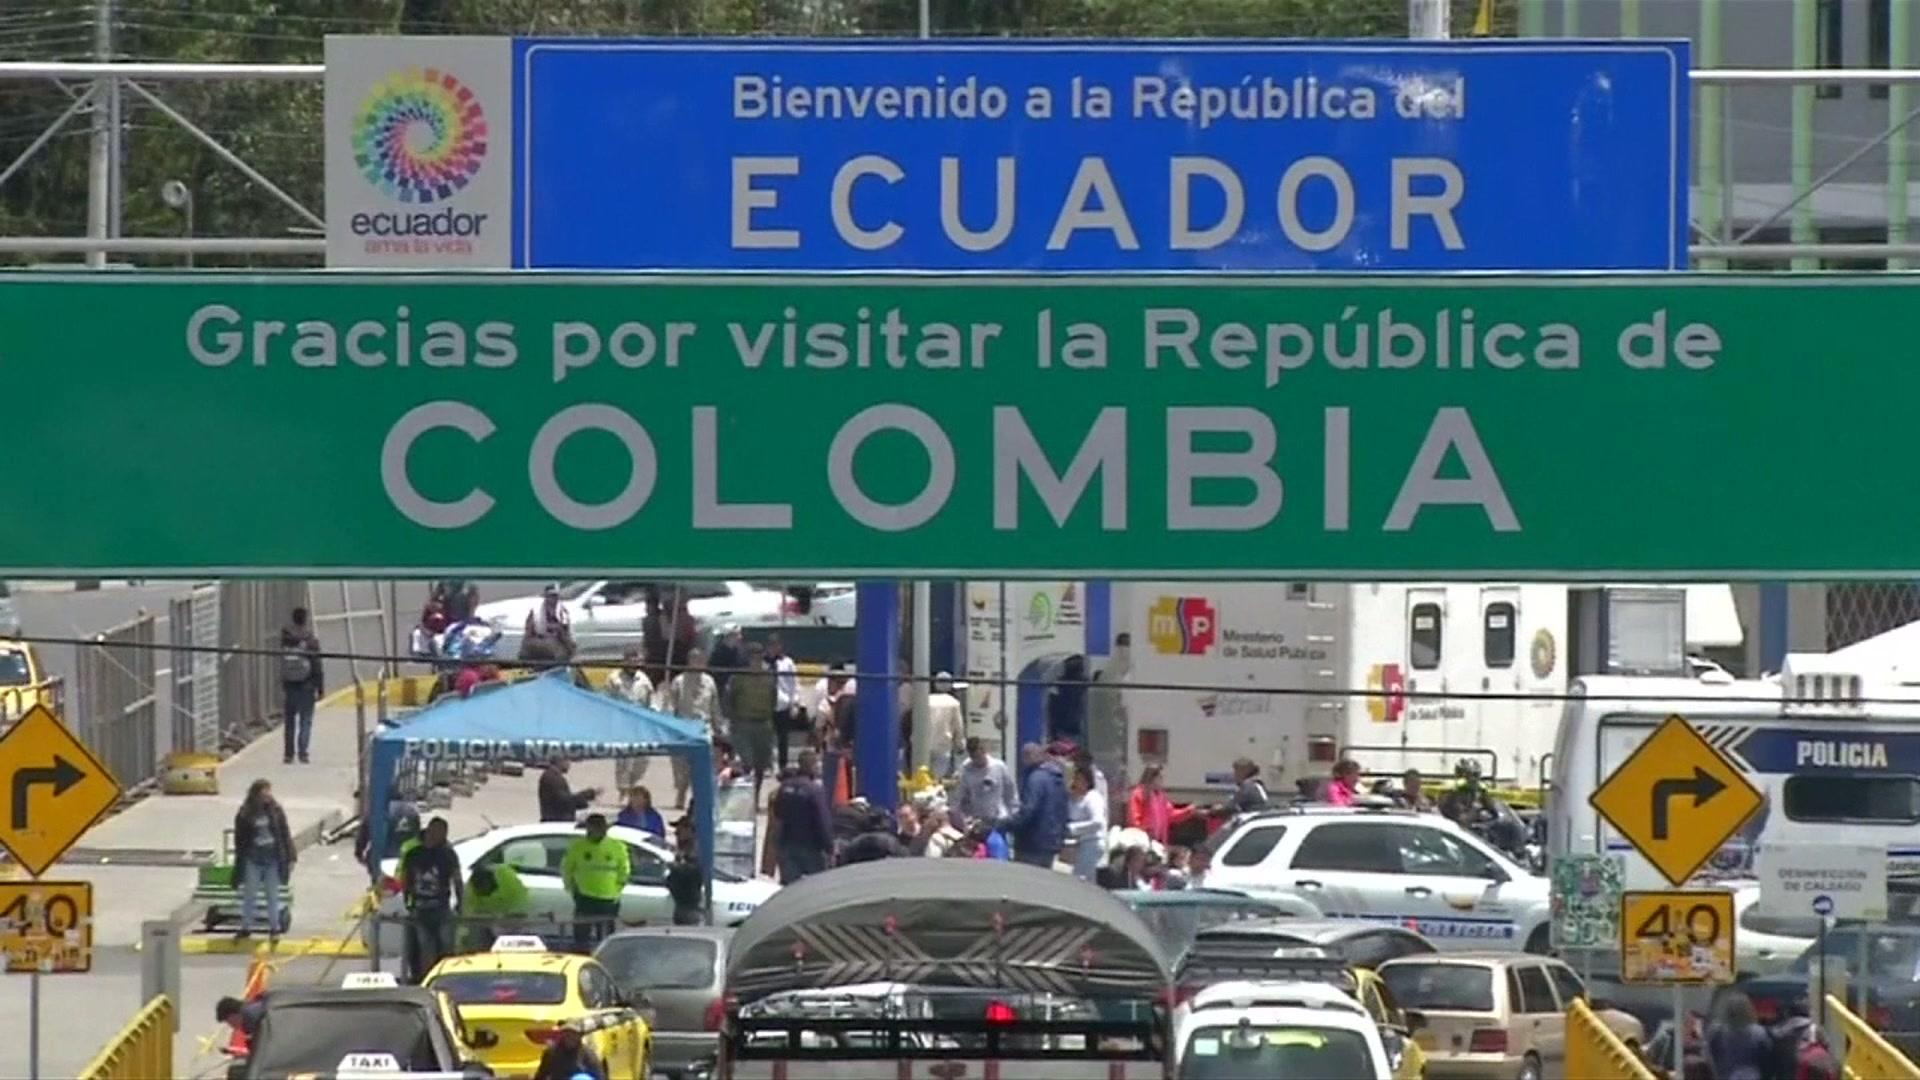 Venezuelan migrants stuck at Ecuador border